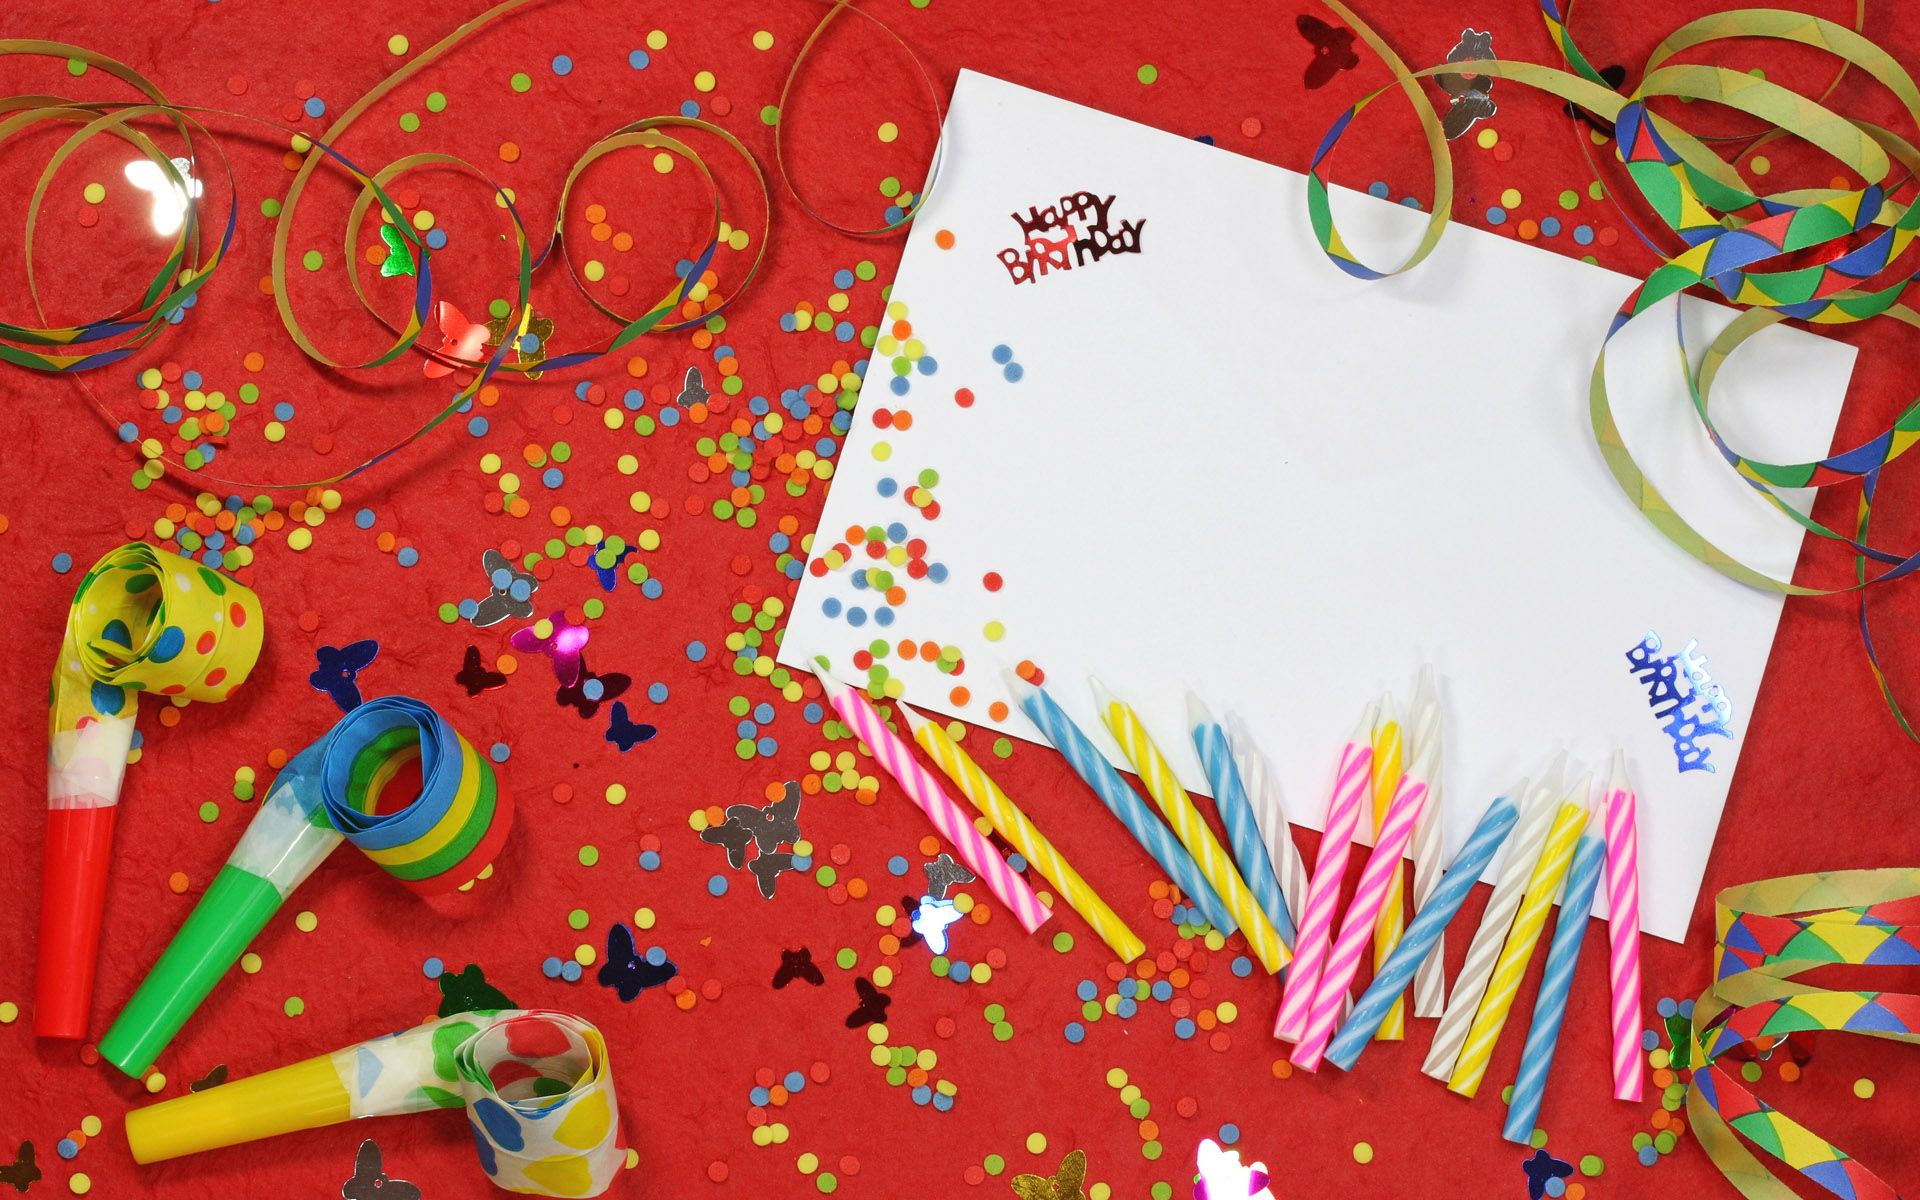 Happy Birthday Card Party